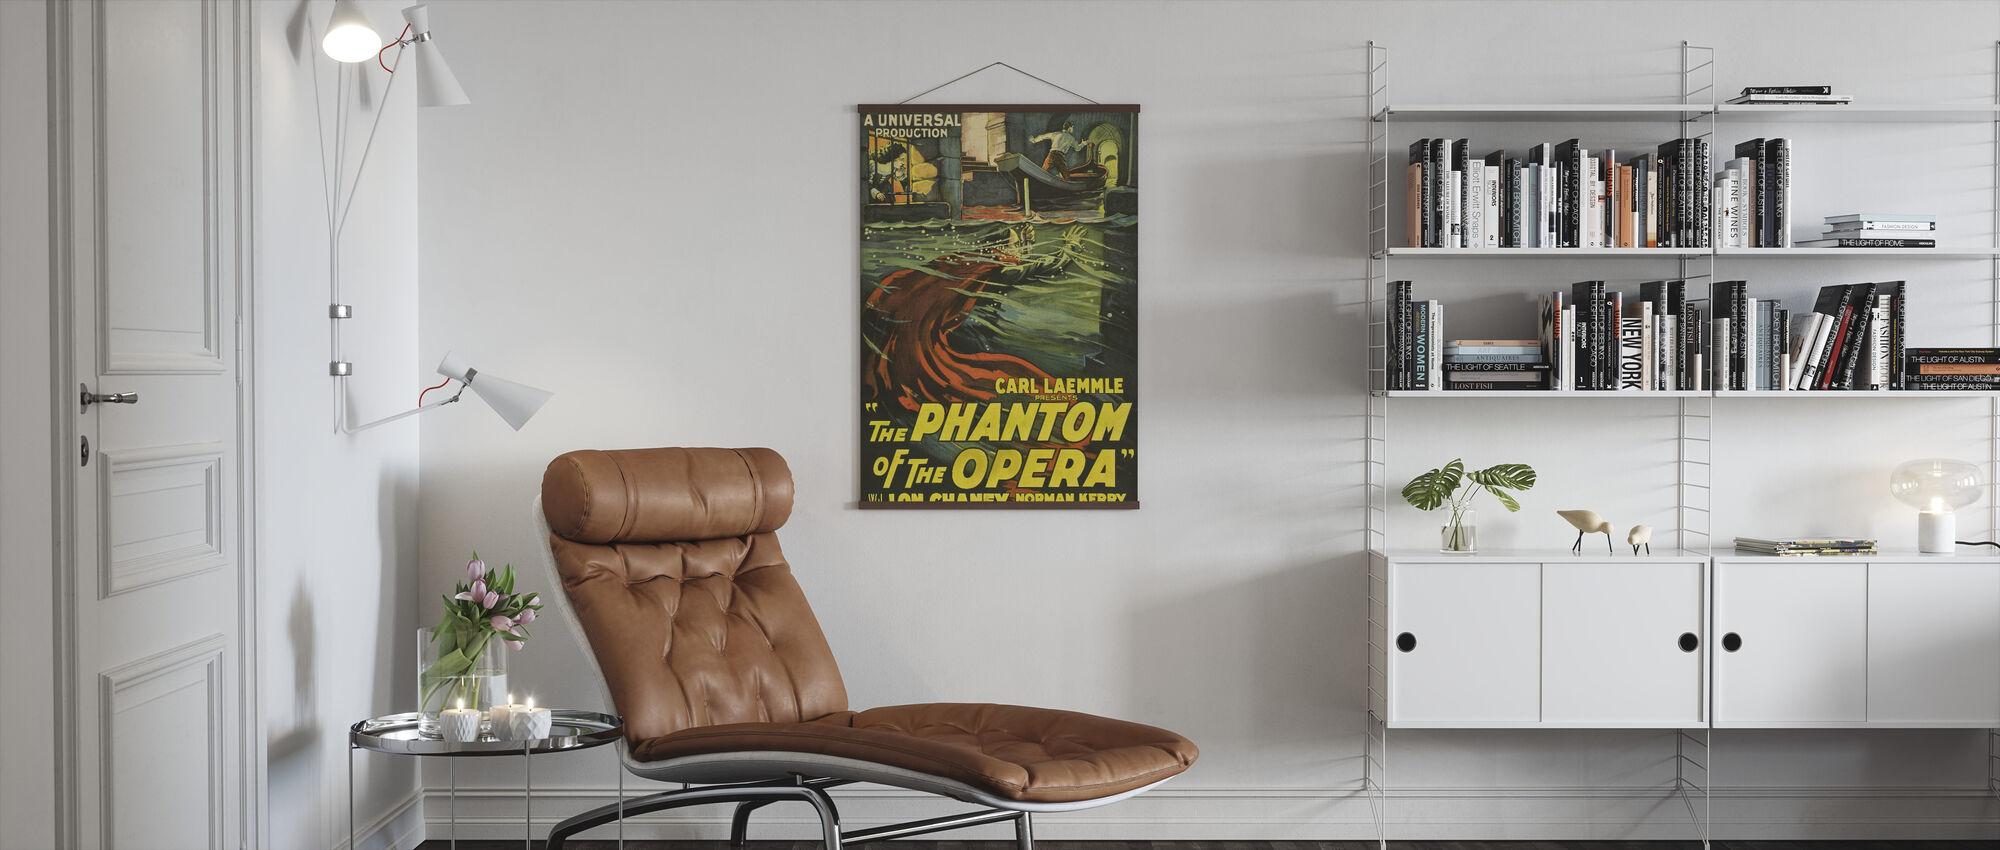 Phantom of the Opera - Poster - Living Room